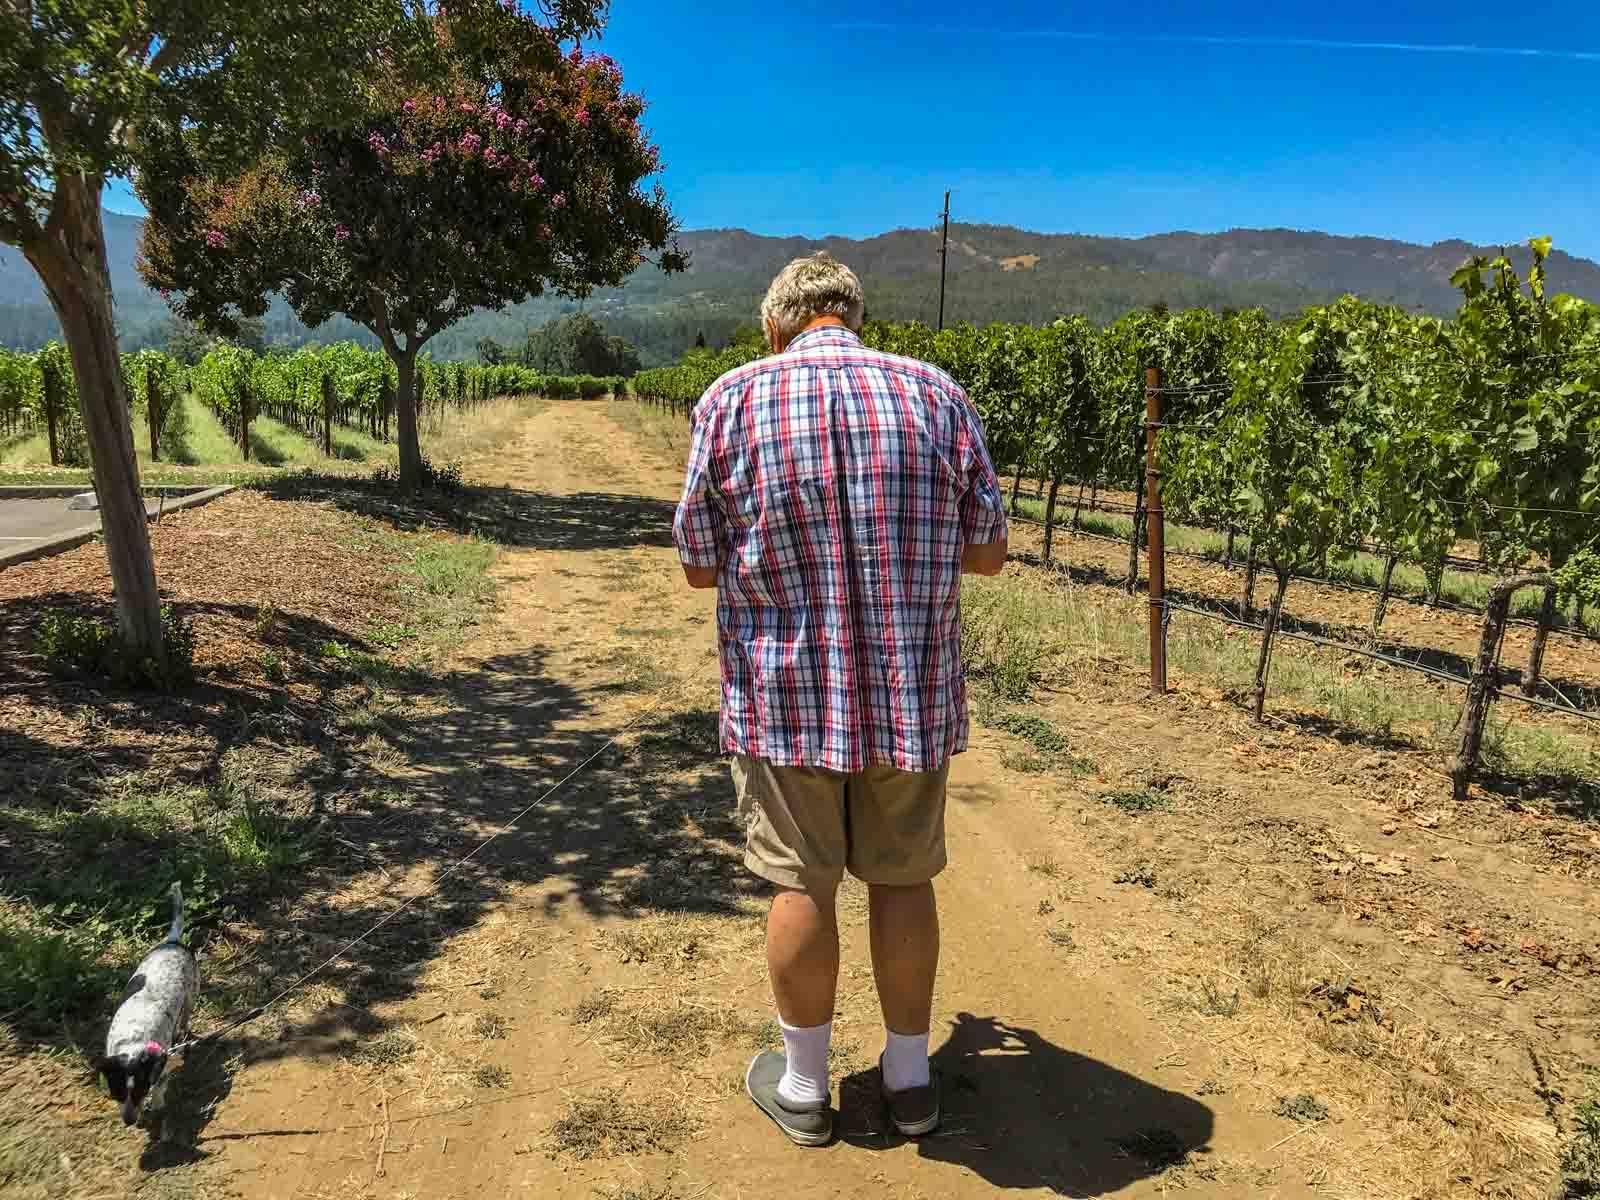 Walking Doodle Dog at a vineyard